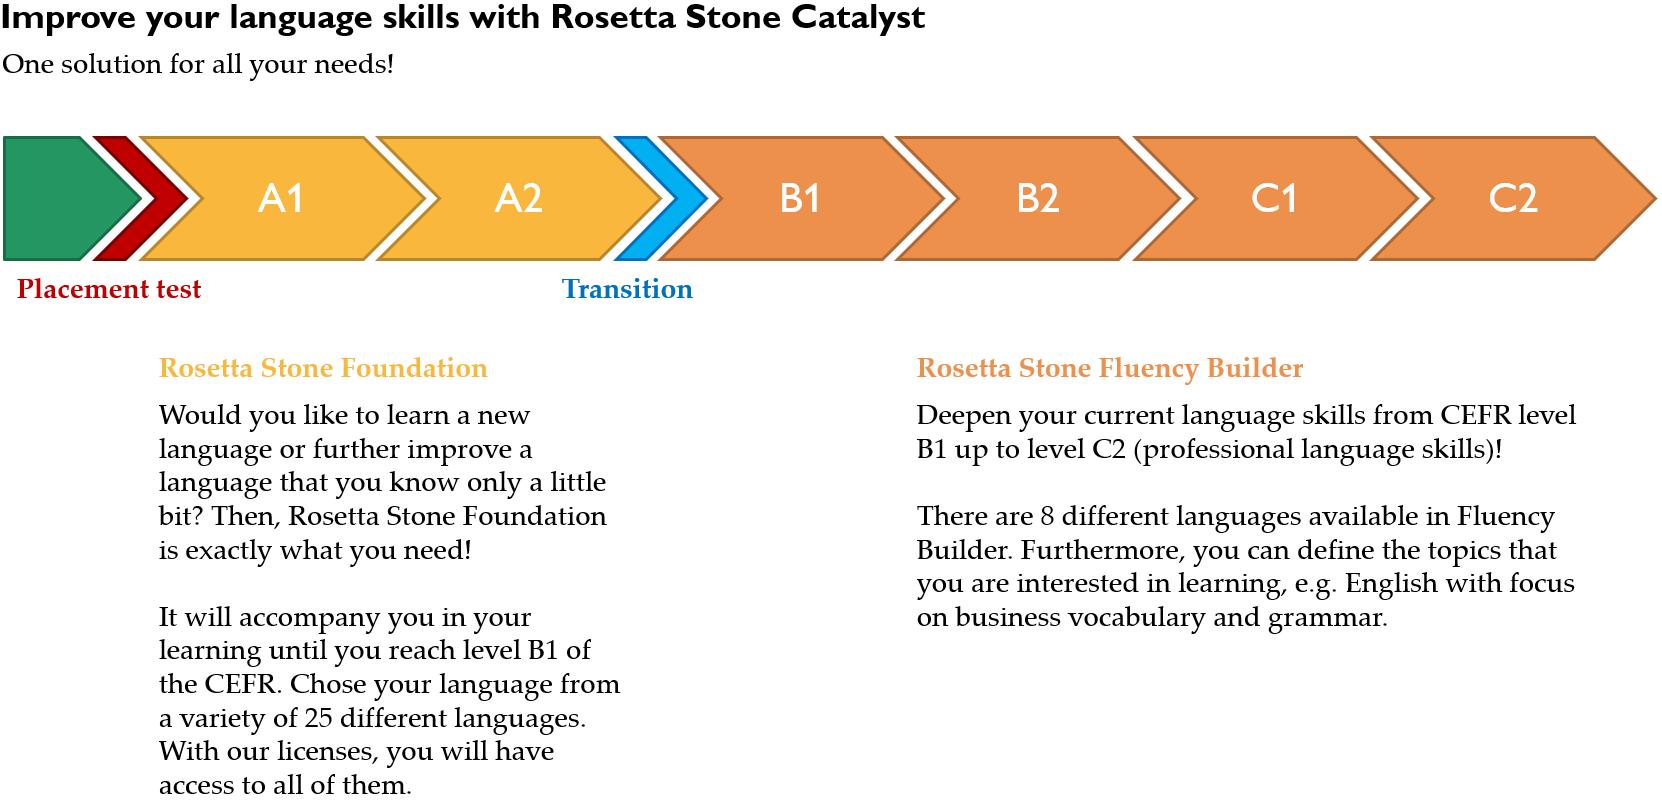 Structure of Rosetta Stone Online